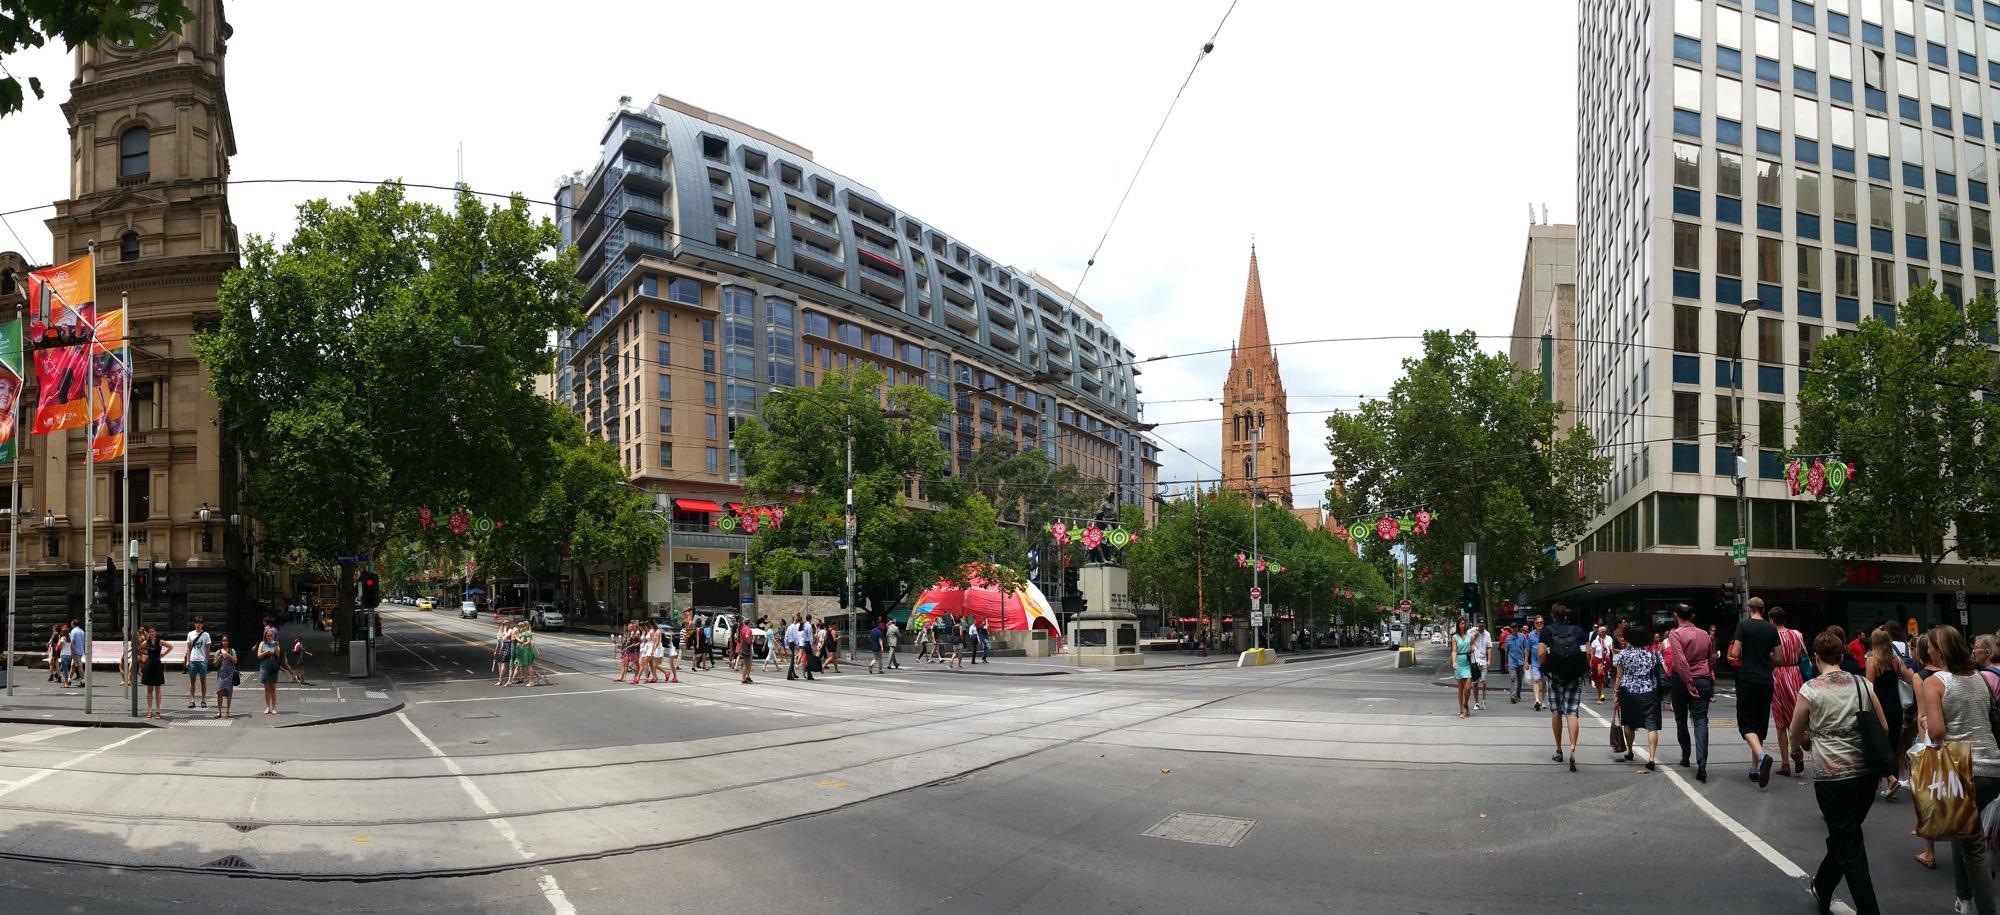 Melbourne stuff - 1 of 223 (200).jpg